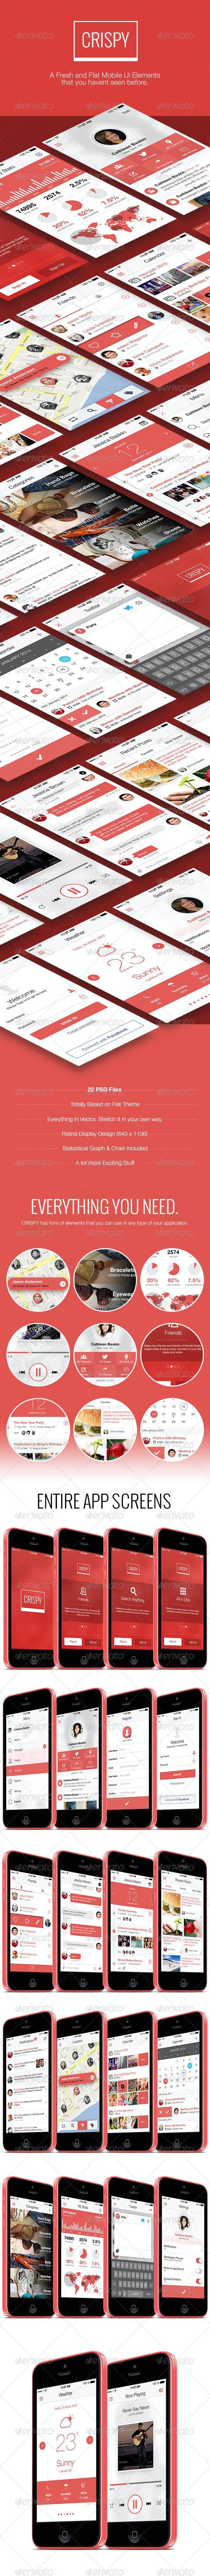 Crispy - A Fresh & Flat Mobile Ui Design - User Interfaces Web Elements